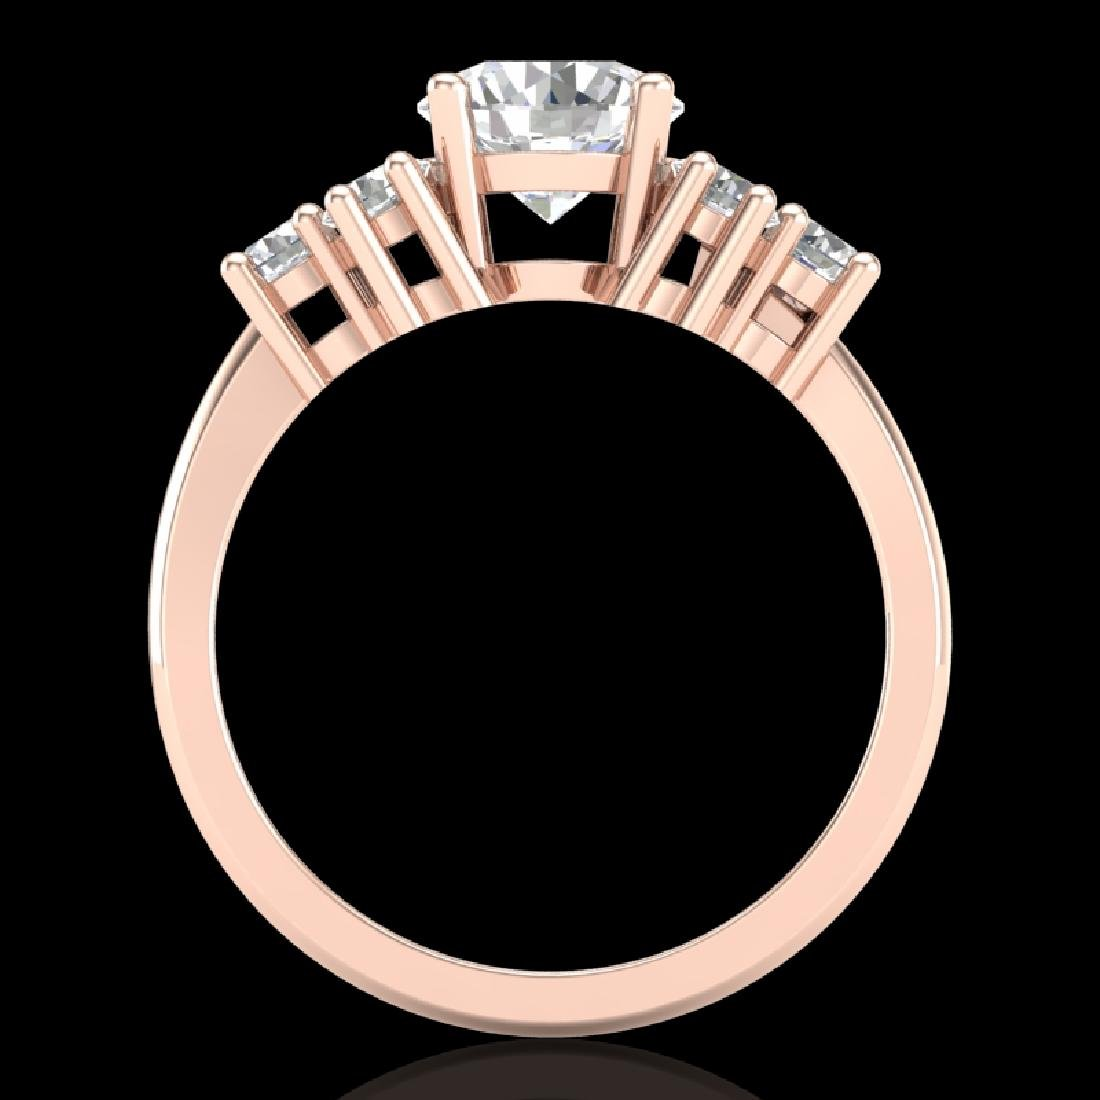 2.1 CTW VS/SI Diamond Solitaire Ring 18K Rose Gold